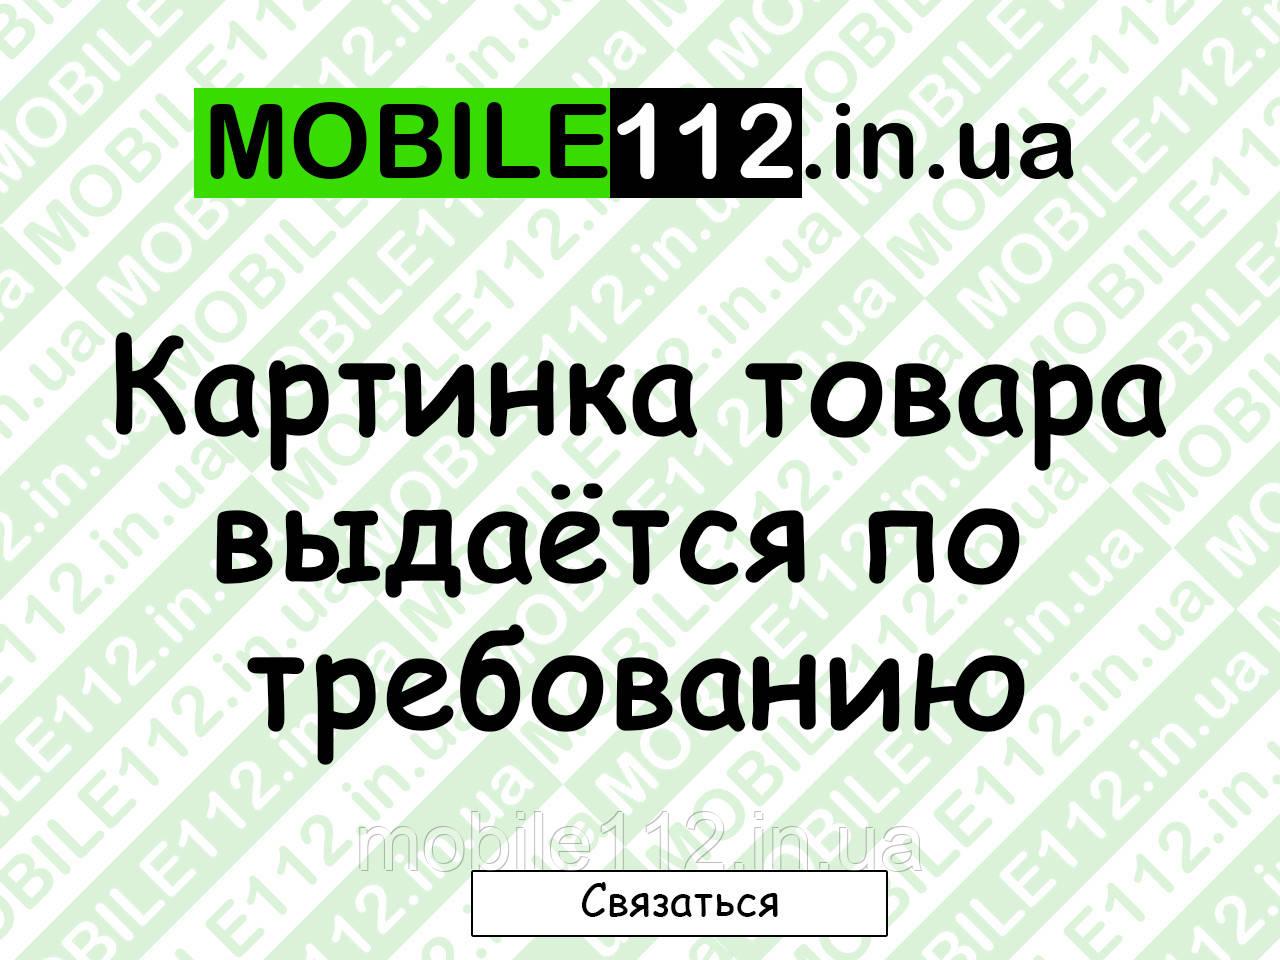 Динамик для iPhone 7 Plus